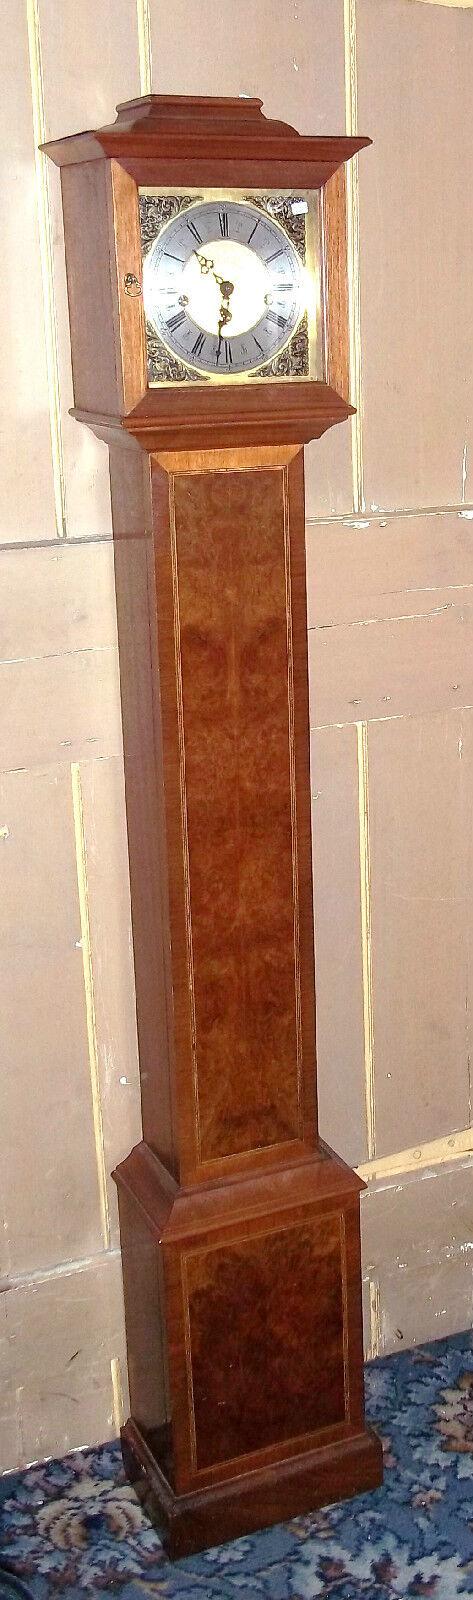 SMALL ELEGANT WESTMINSTER CHIMING WALNUT INLAID GRANDMOTHER CLOCK